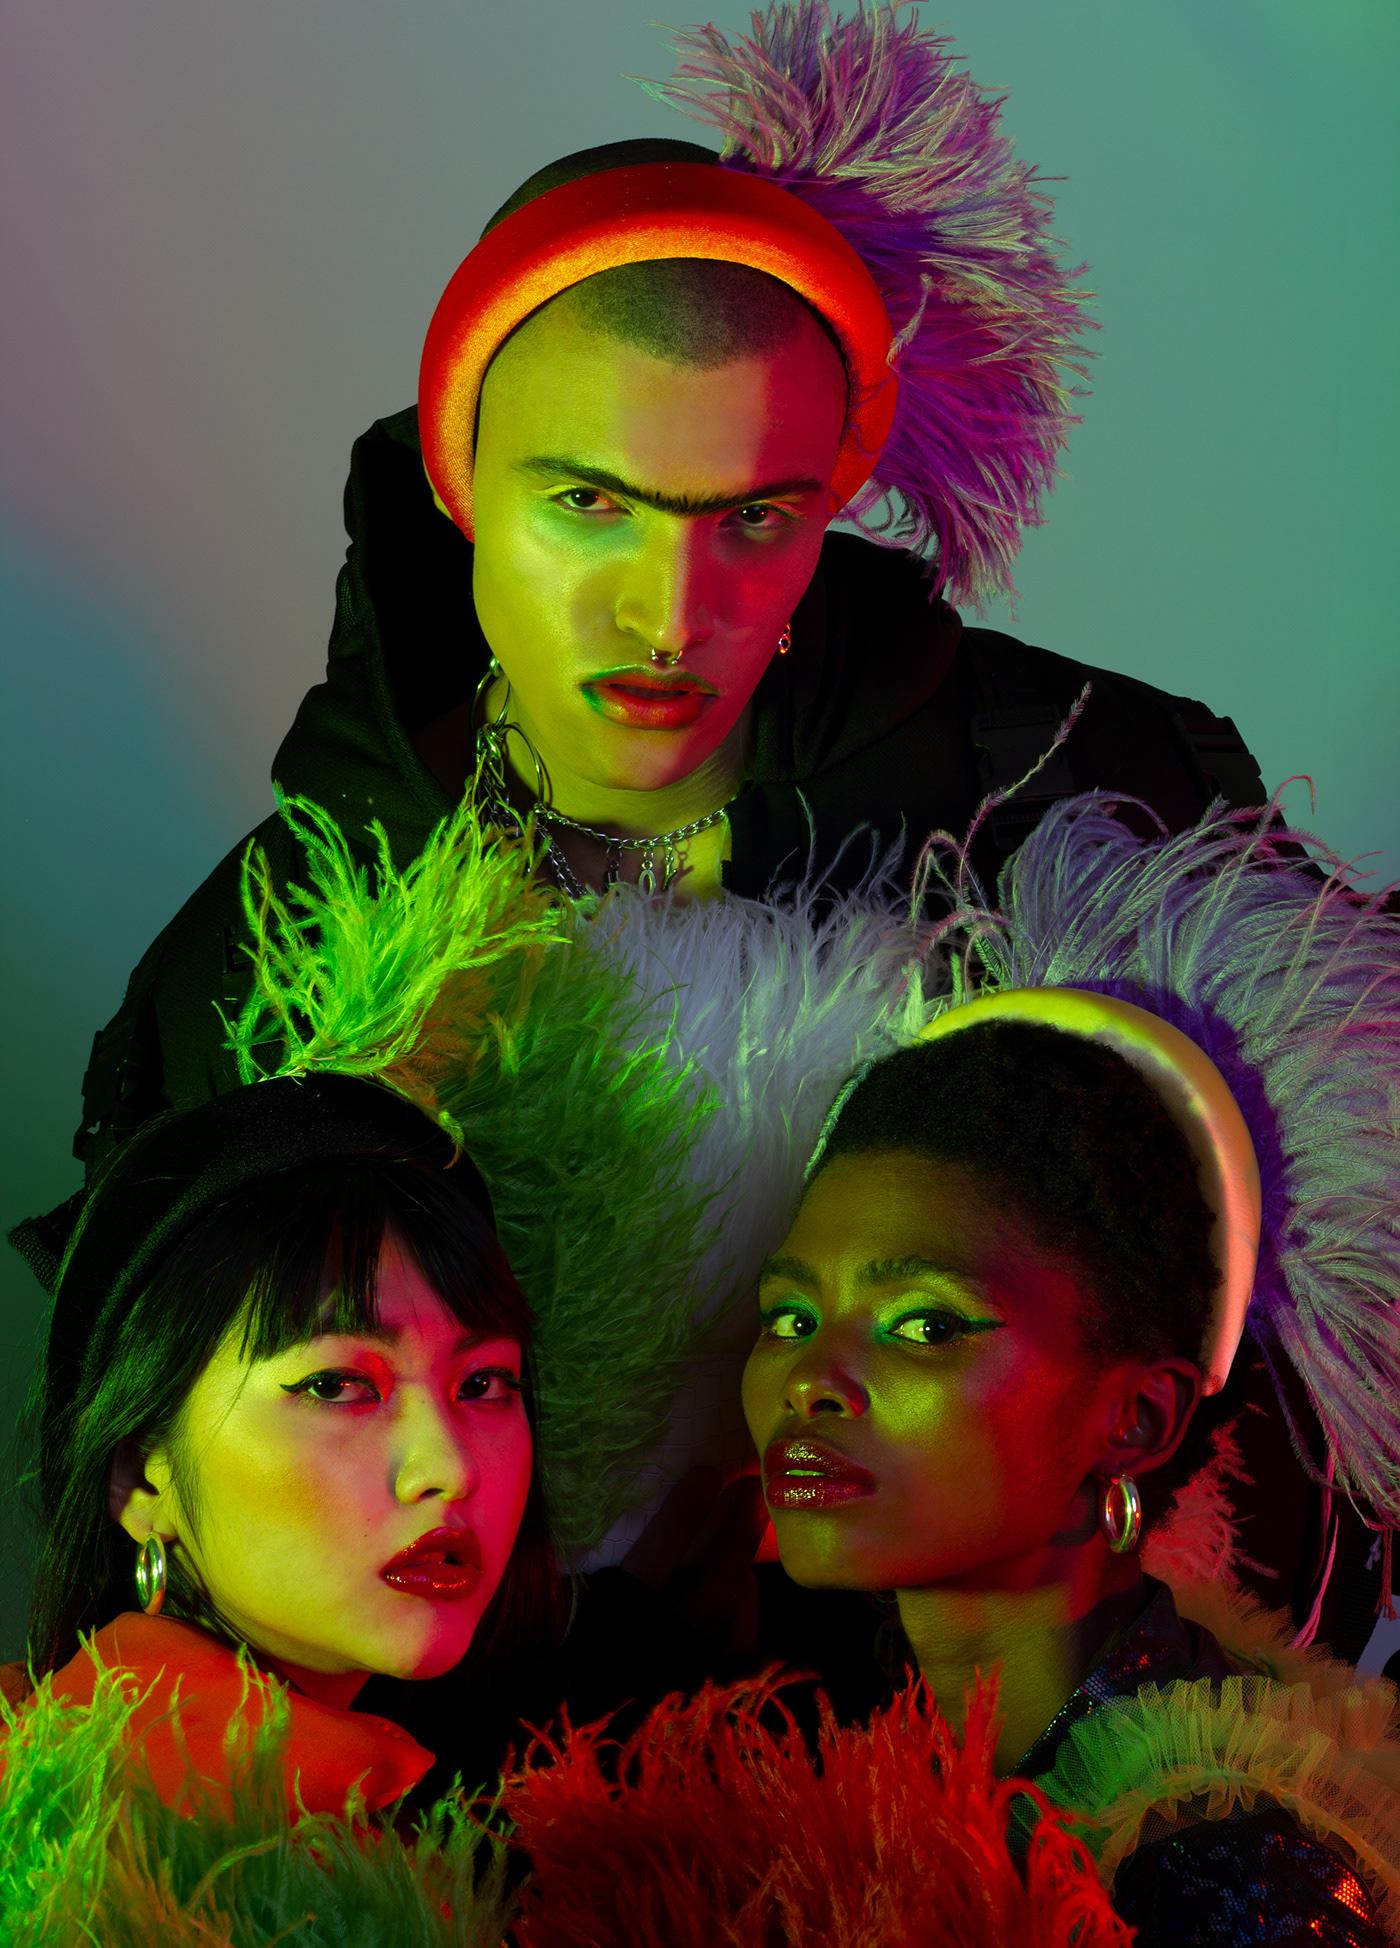 85mm,campaign,Canon,colour gels,Fashion ,fashion photography,gels,hat,portrait,portrait photography